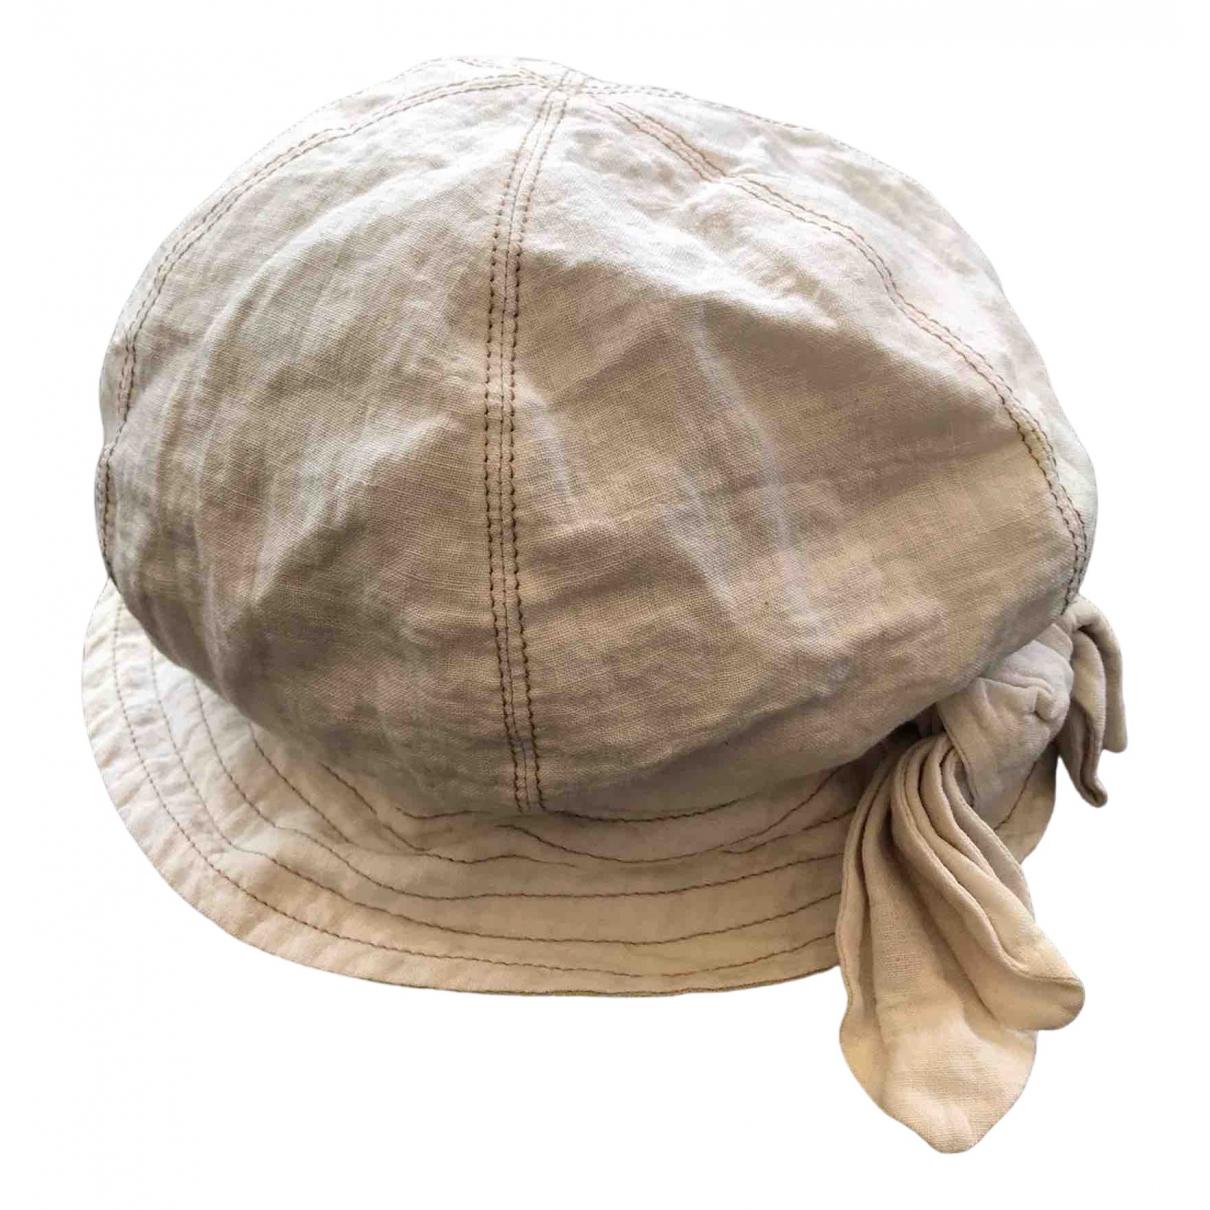 Vivienne Westwood \N Linen hat for Women M International